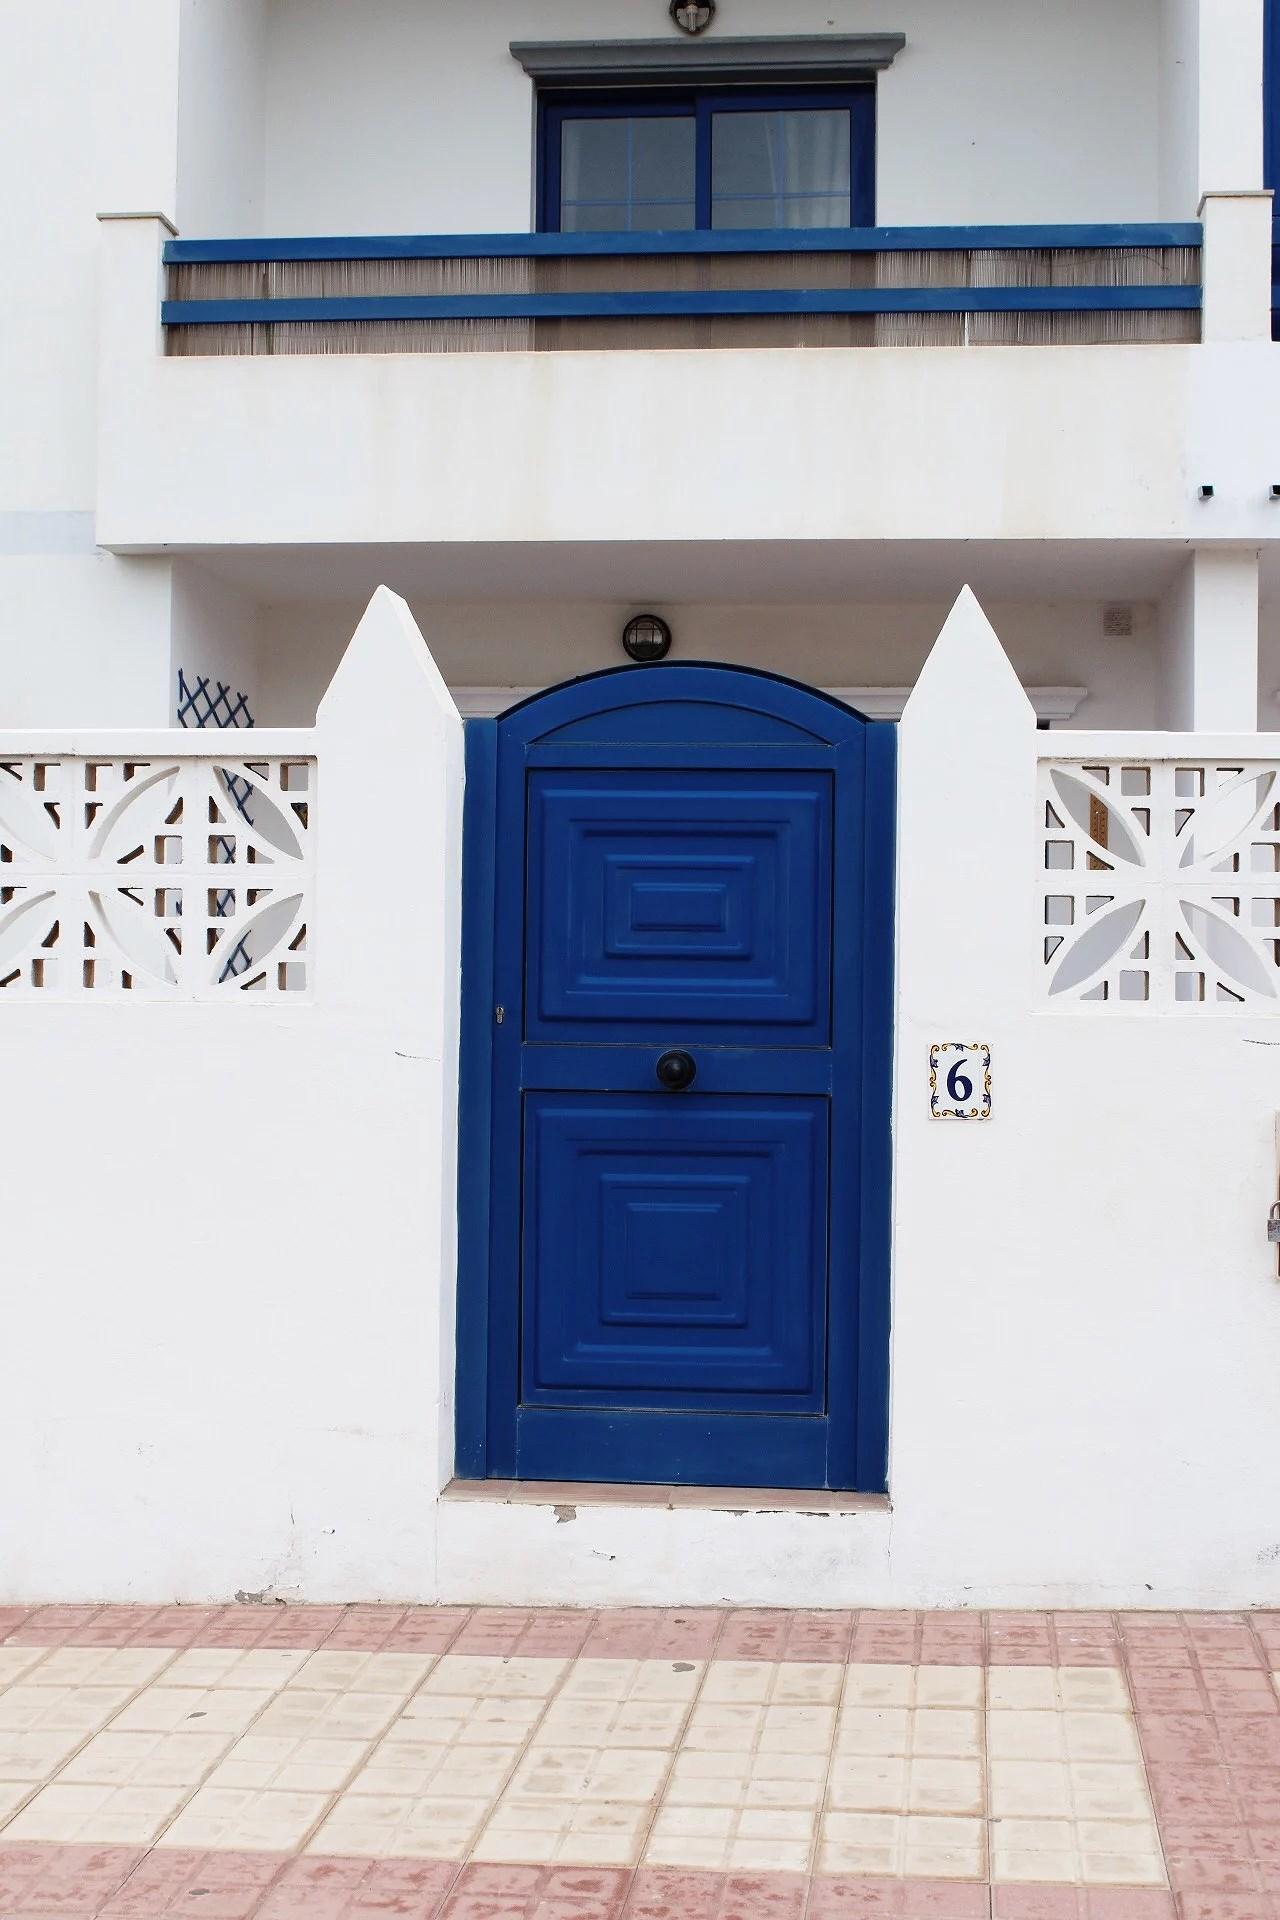 White Wall, blue door